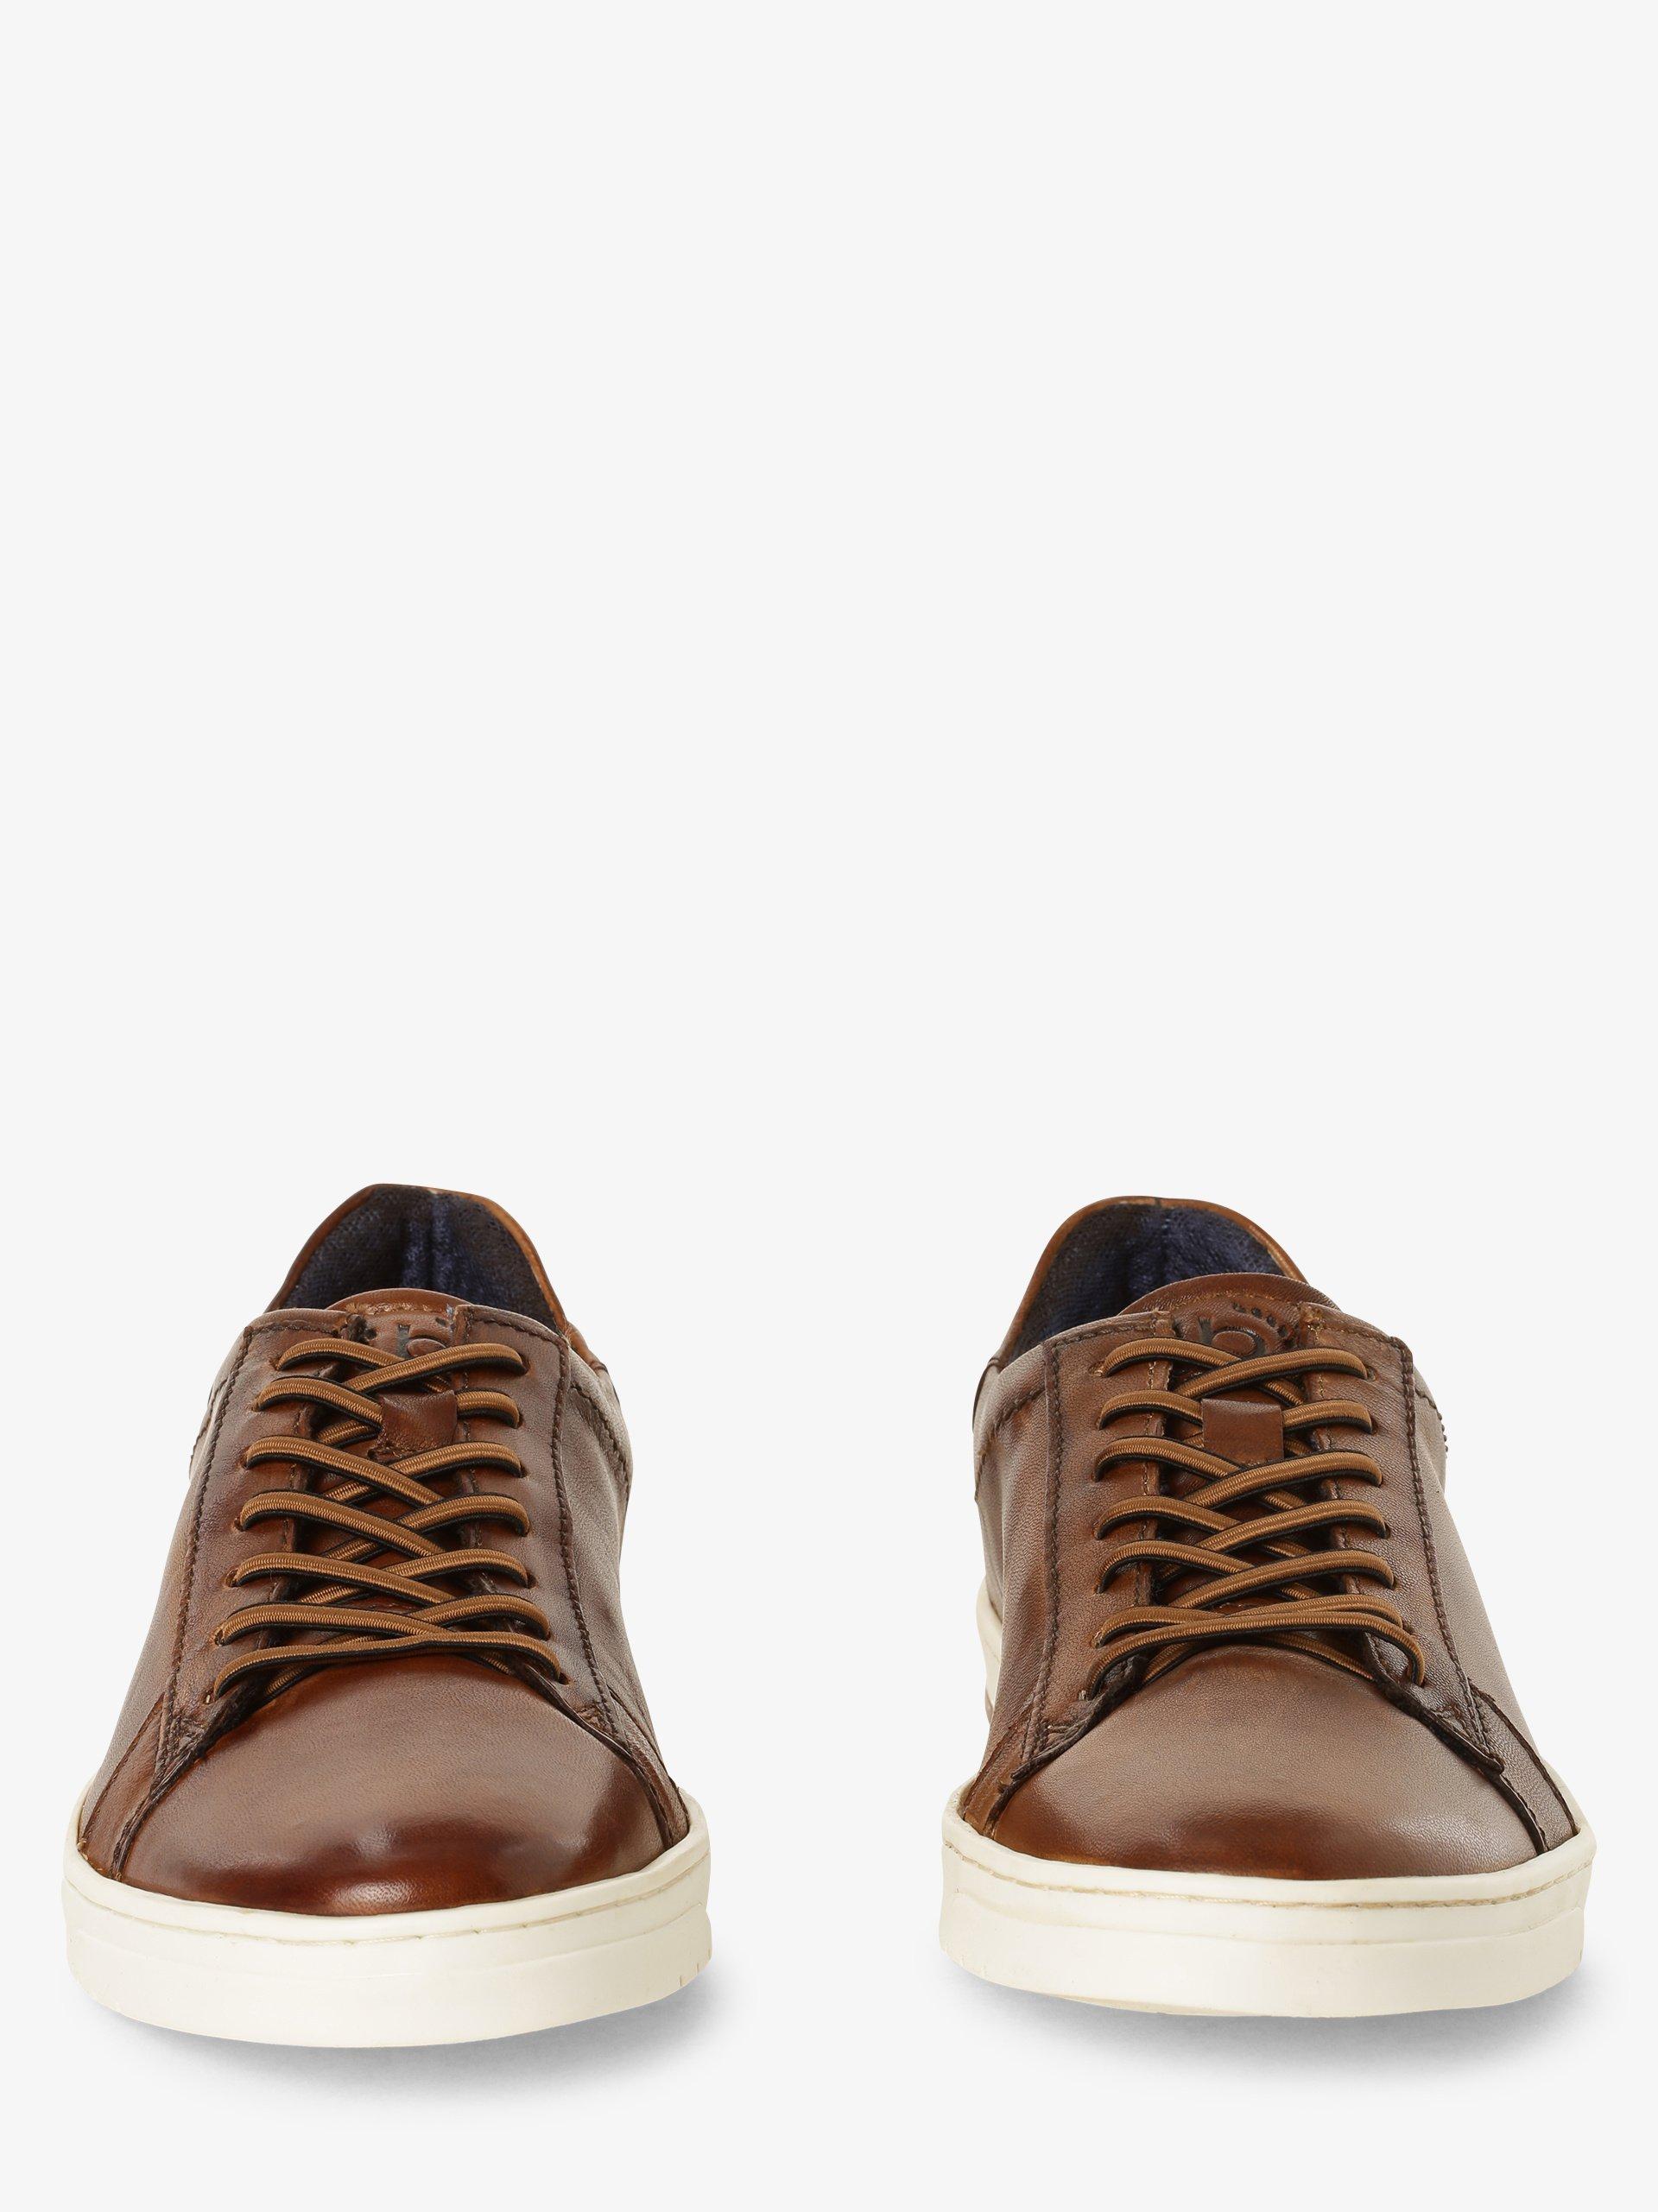 Bugatti Herren Sneaker aus Leder